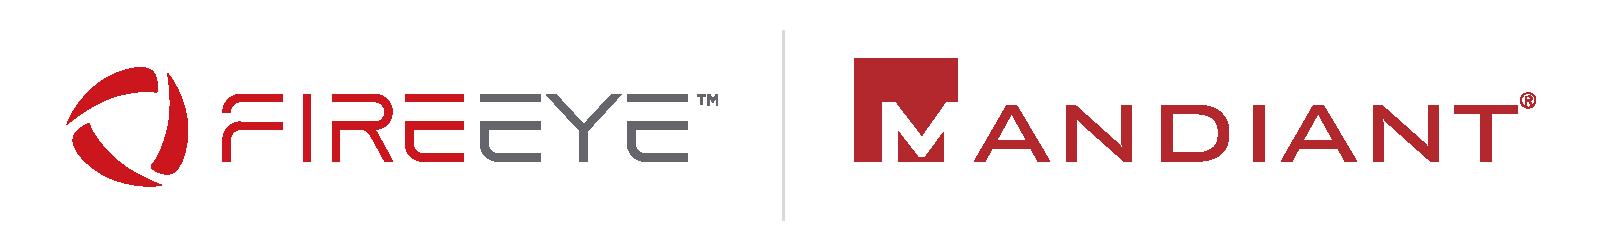 Fireeye / Mandiant logo